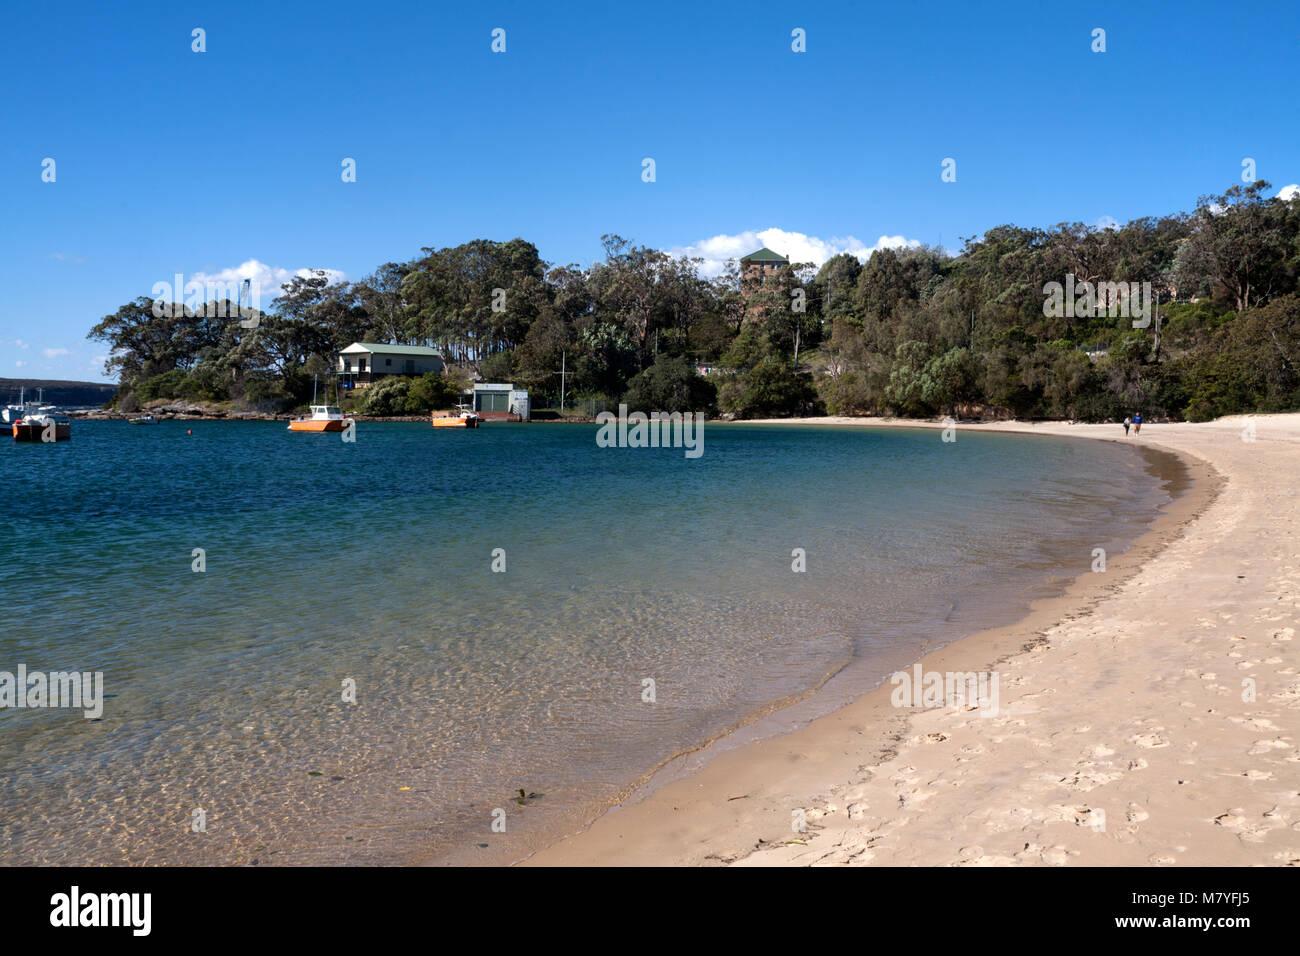 balmoral beach headland park mosman sydney new south wales australia - Stock Image